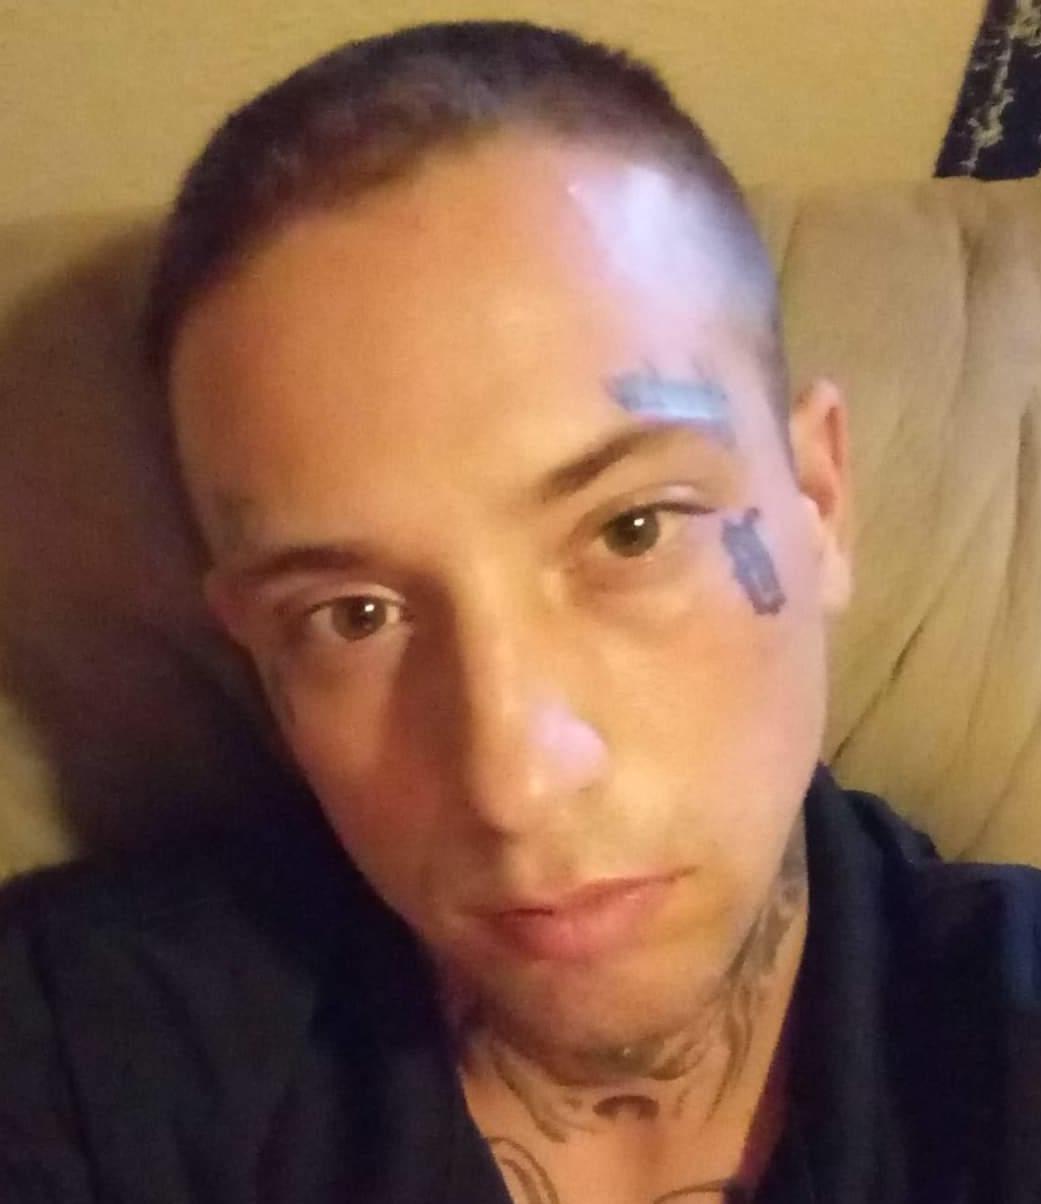 Shooting In Commerce City Colorado: Elias Eugene Pickett, Age 27